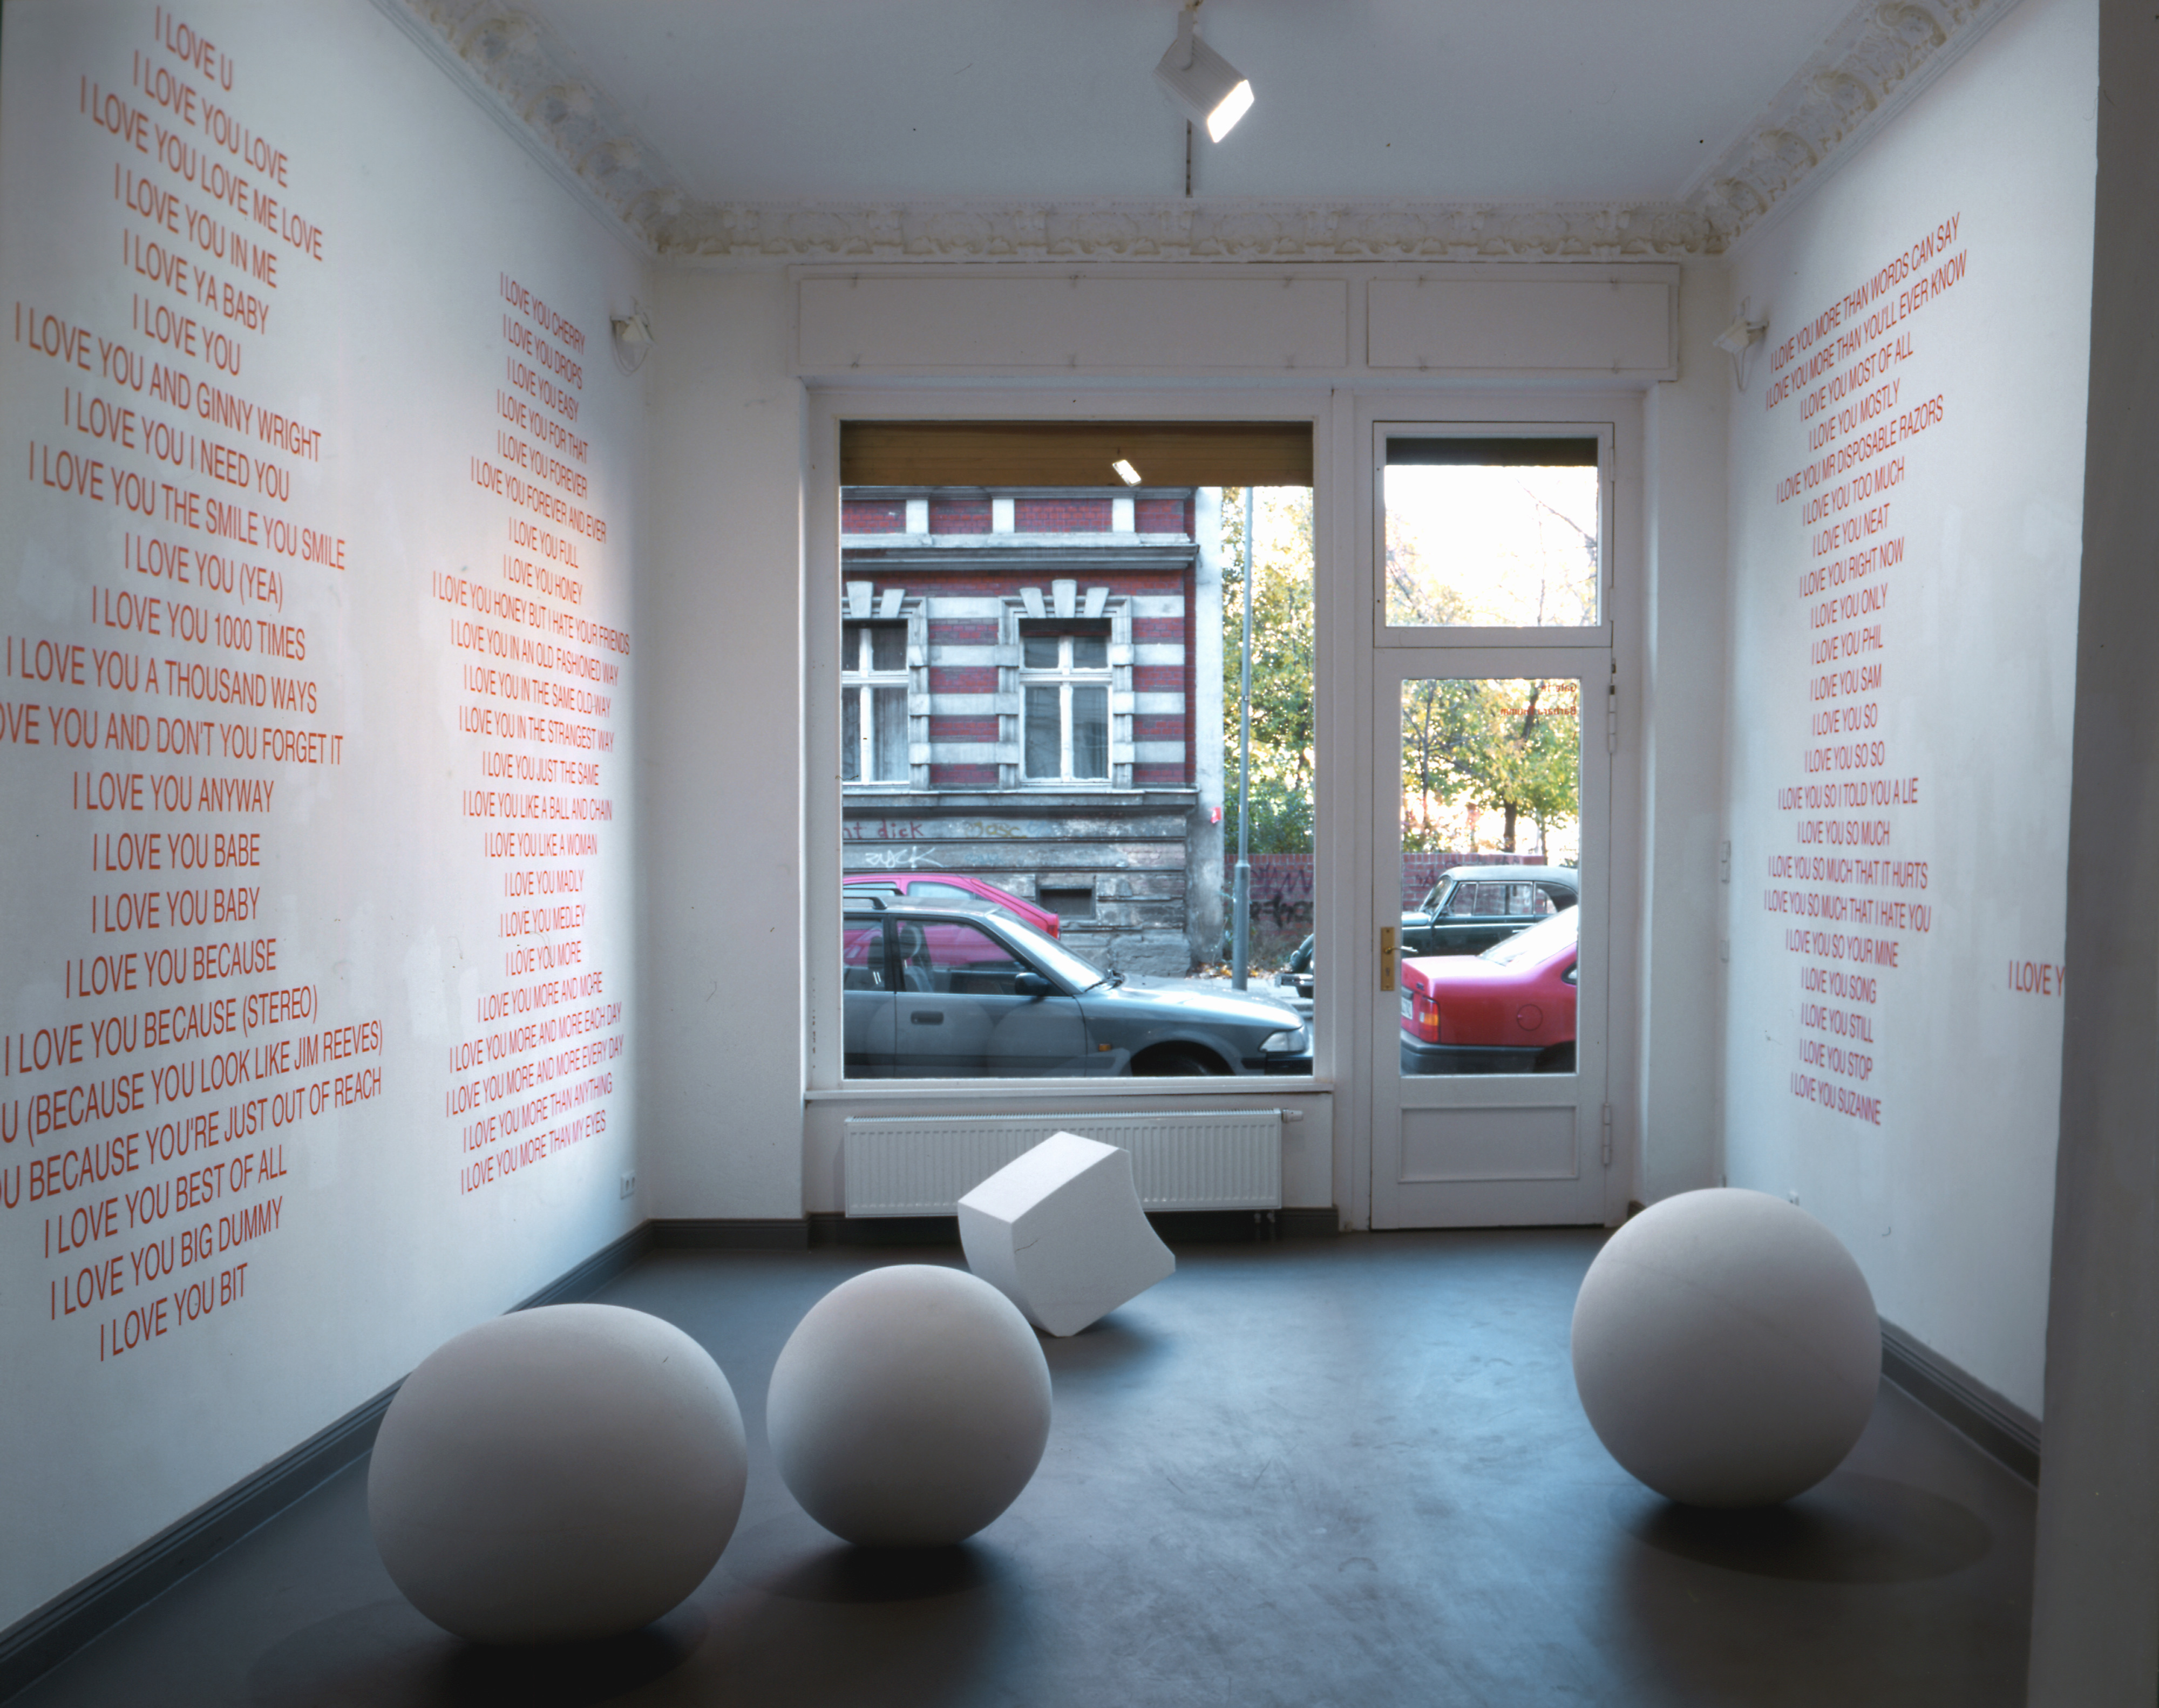 Galerie Barbara Thumm \ Fiona Banner aka The Vanity Press